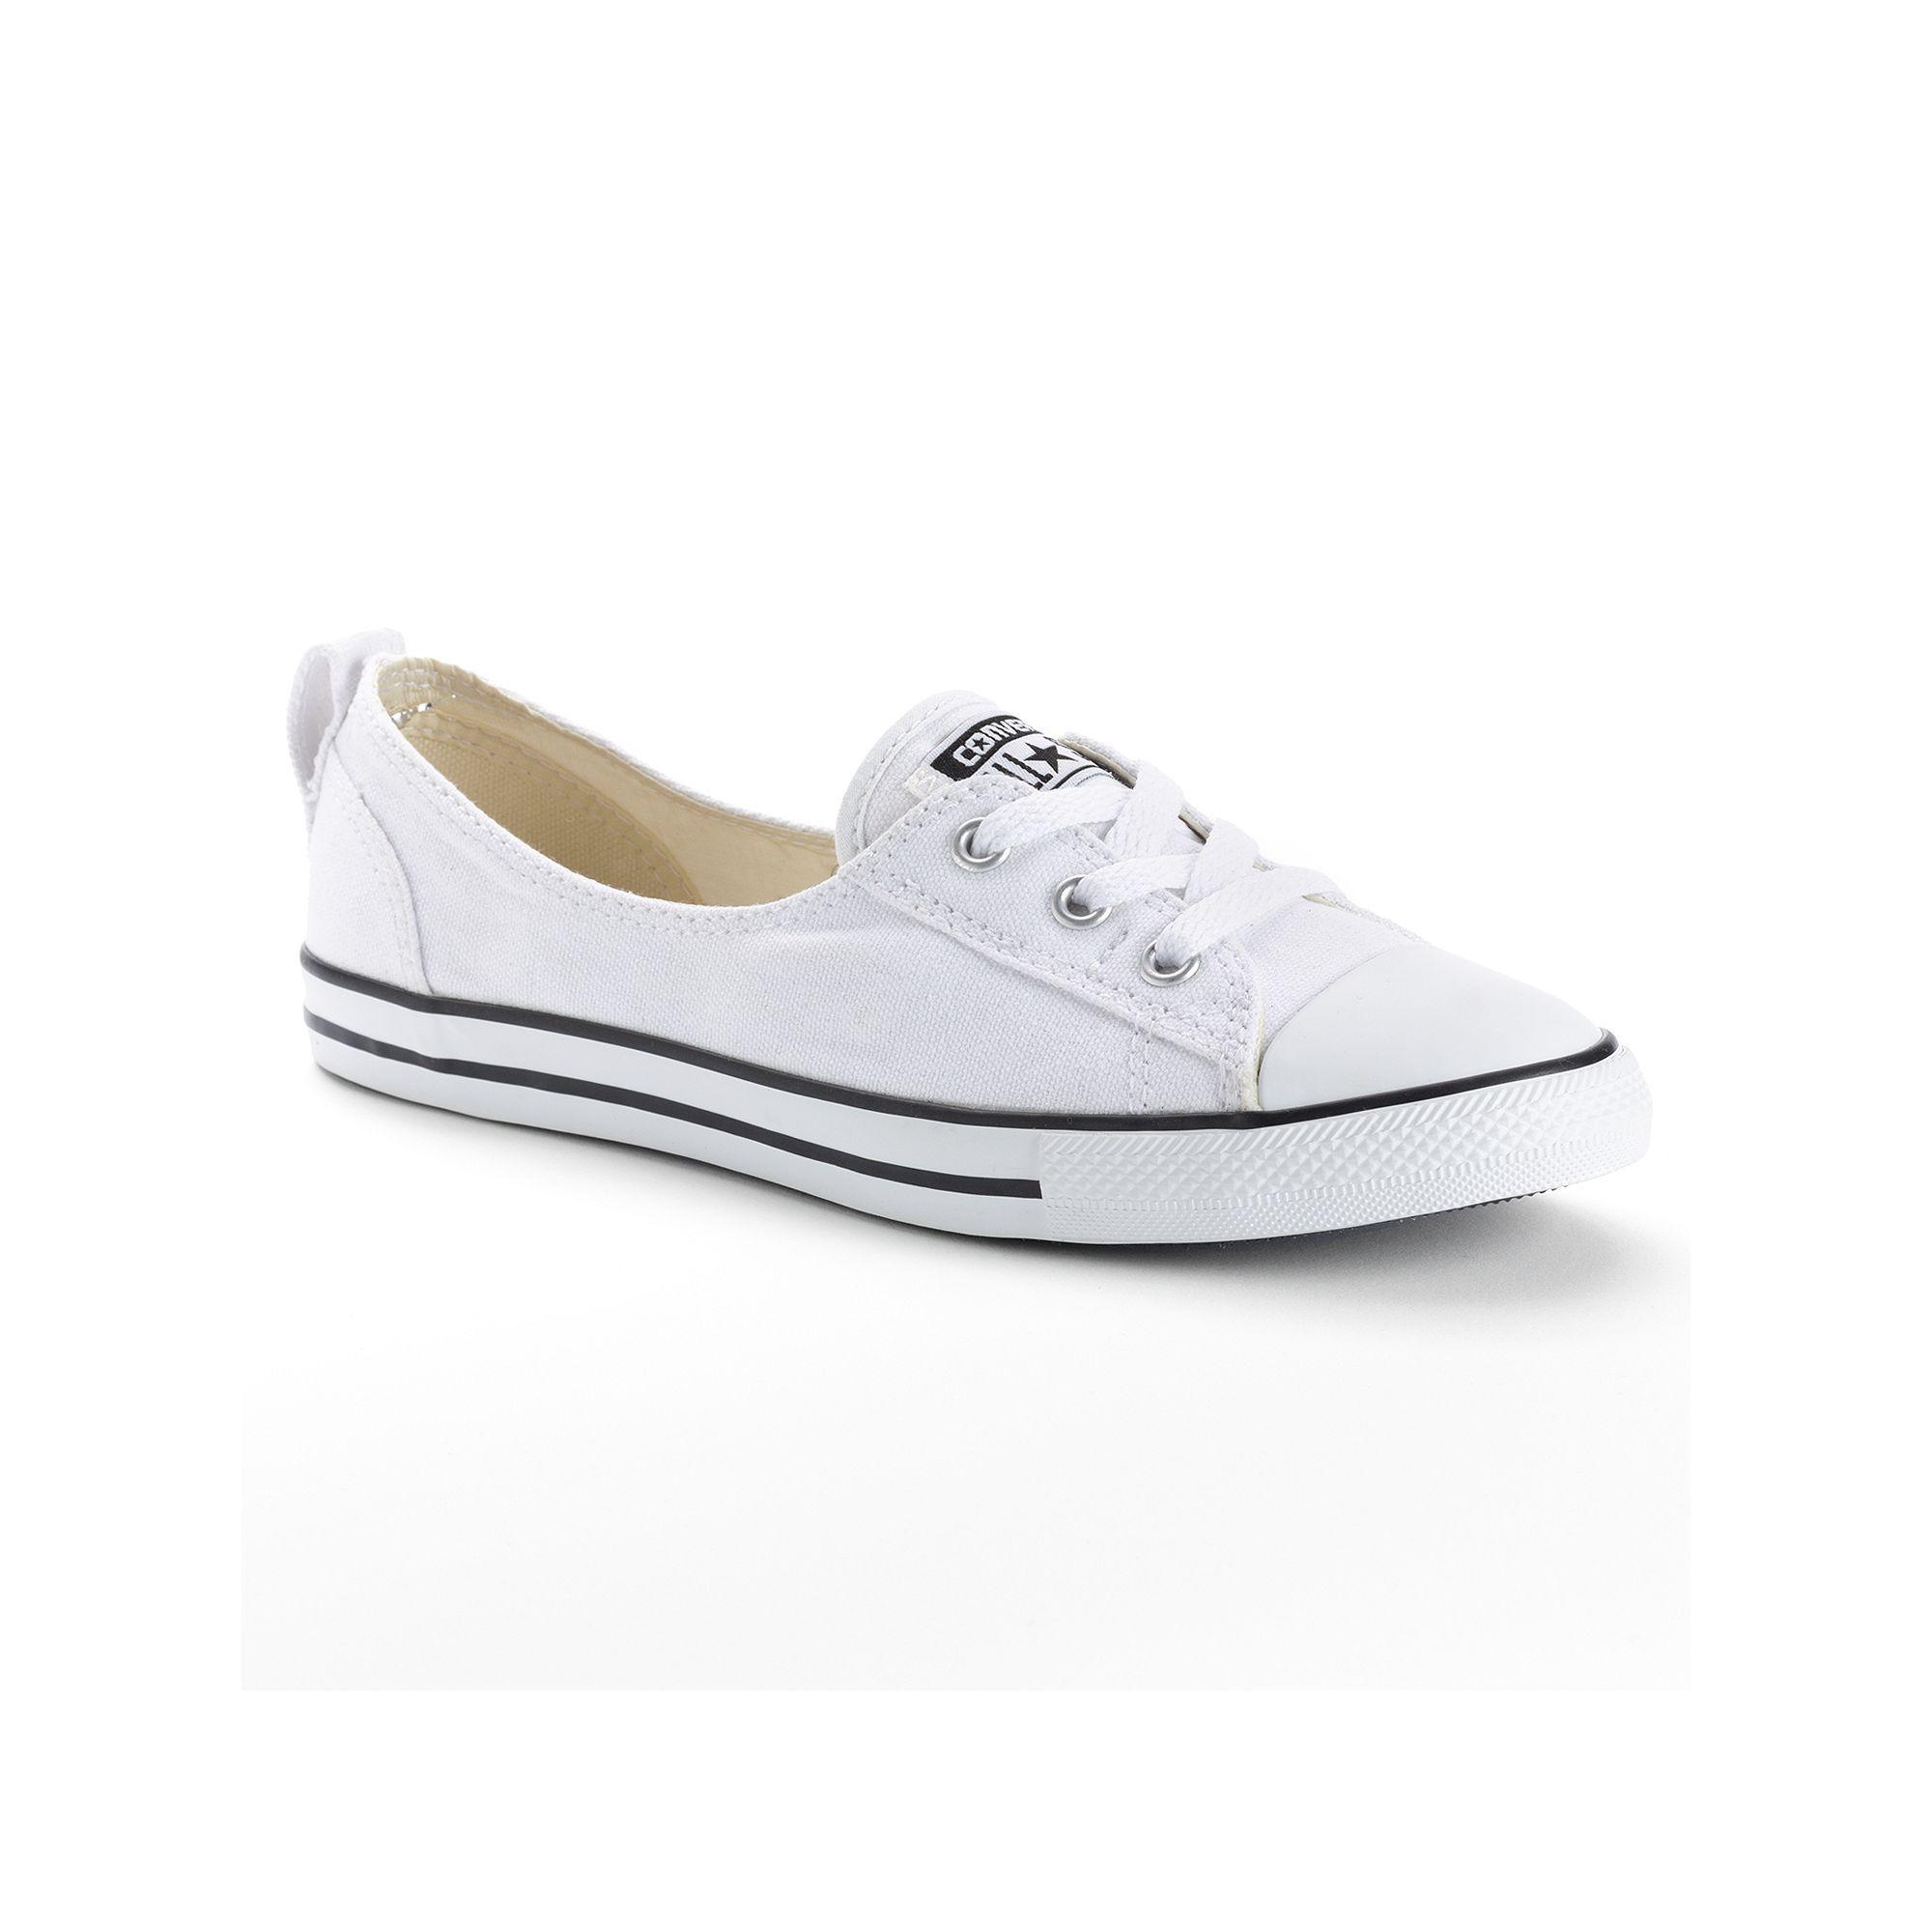 converse chuck taylor white size 5